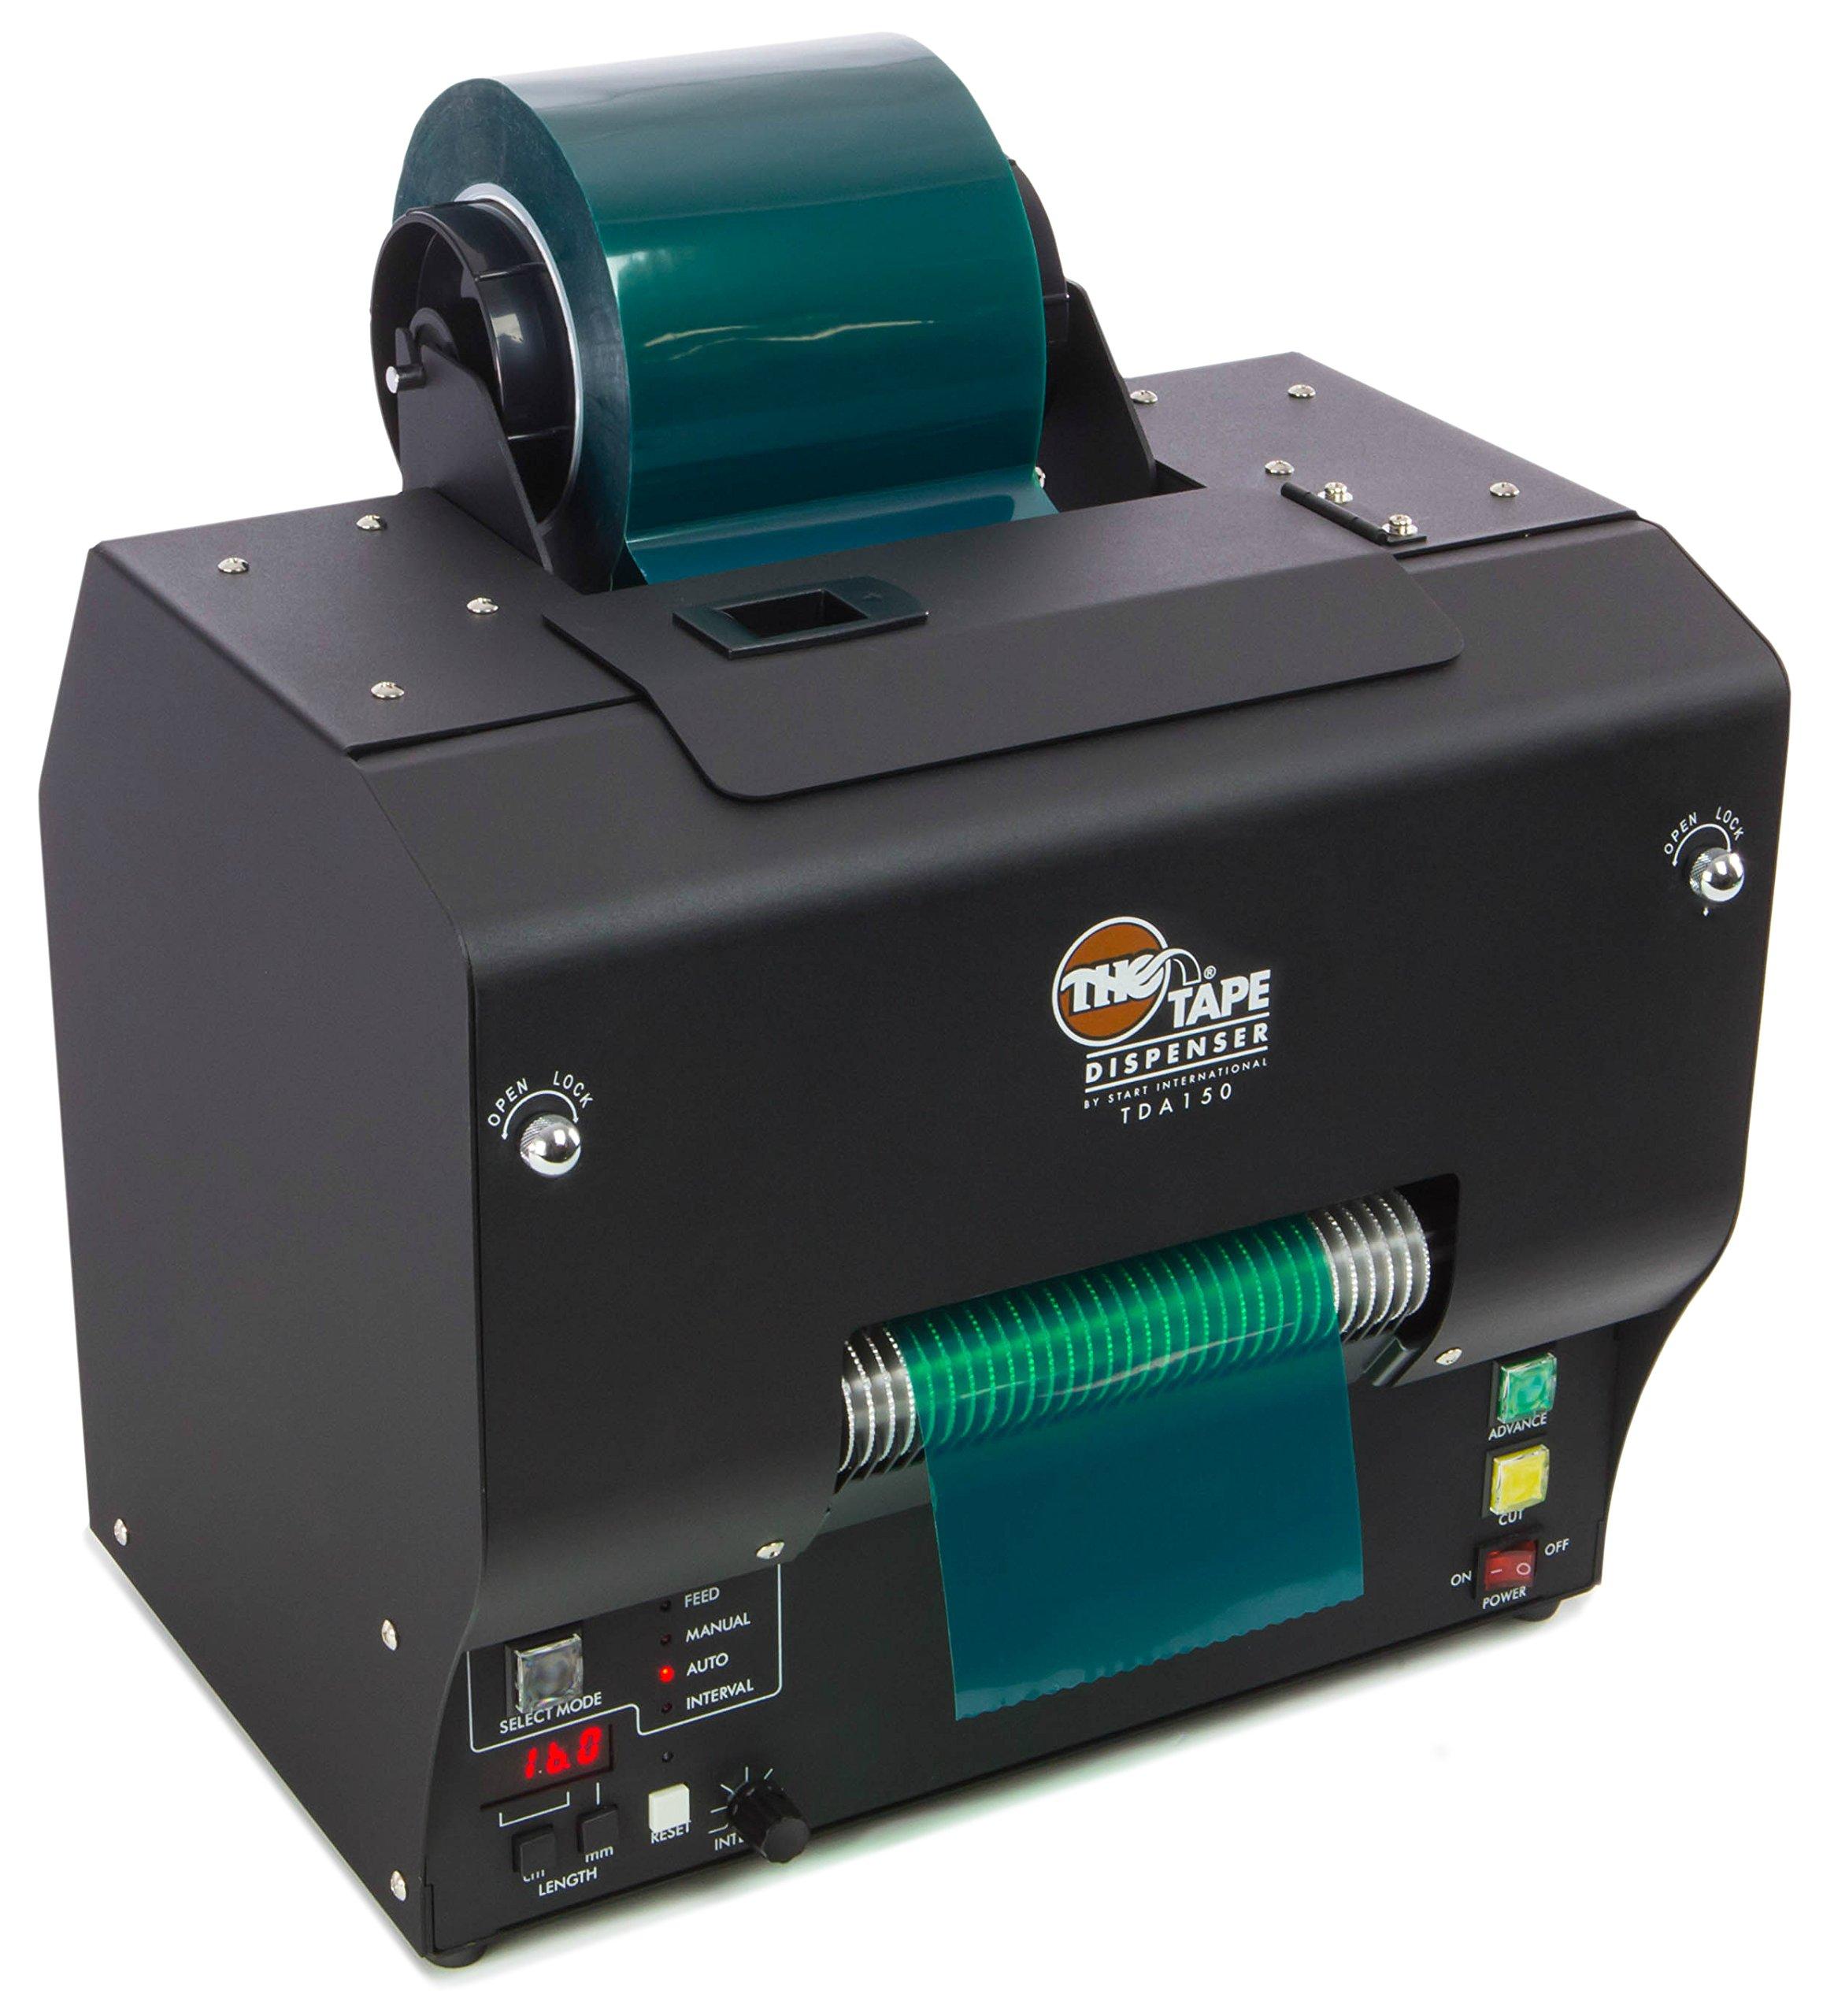 START International TDA150-M Electronic Heavy Duty Wide Tape Dispenser with Memory